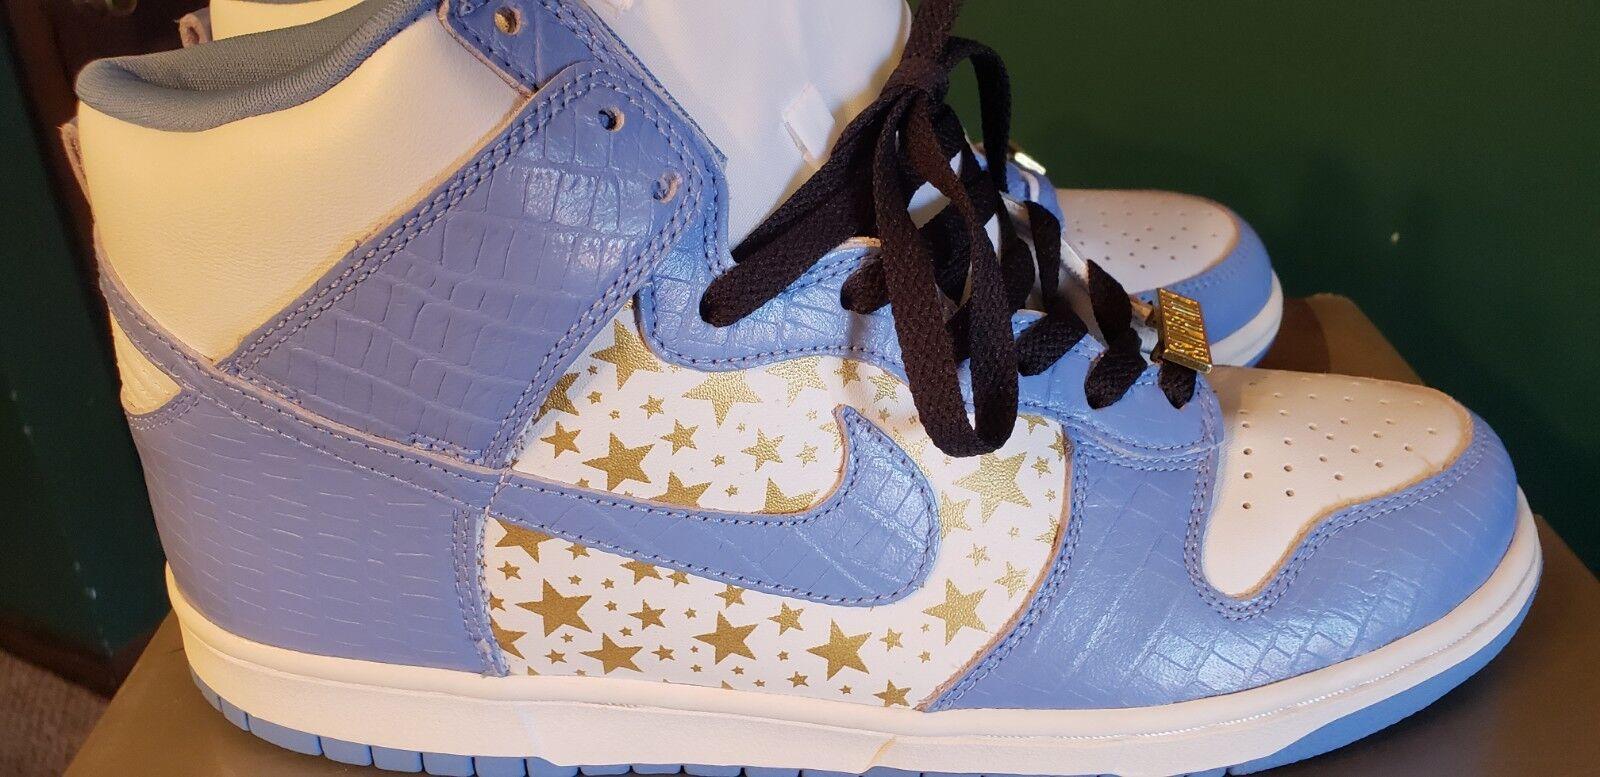 Nike Dunk High SB Supreme bluee 10.5 low pro co.jp